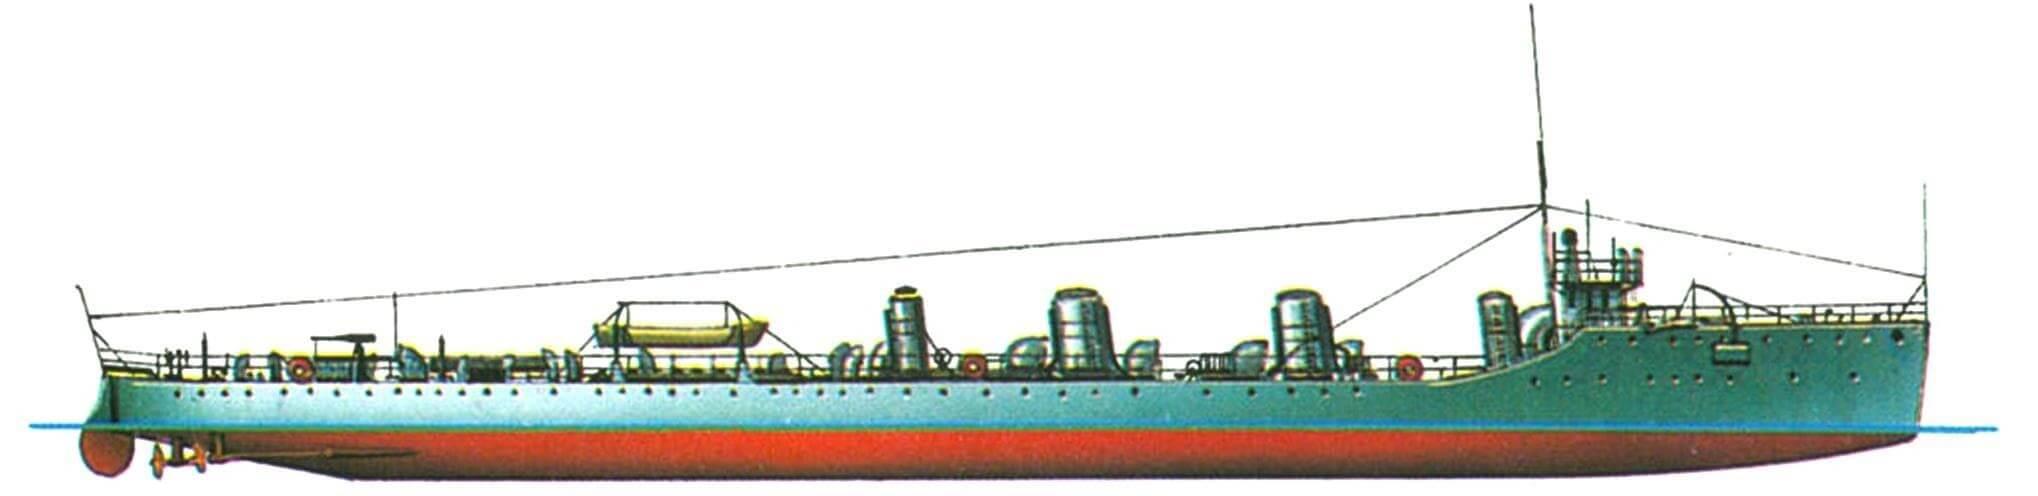 151. Эскадренный миноносец «Мохок», Англия, 1908 г.